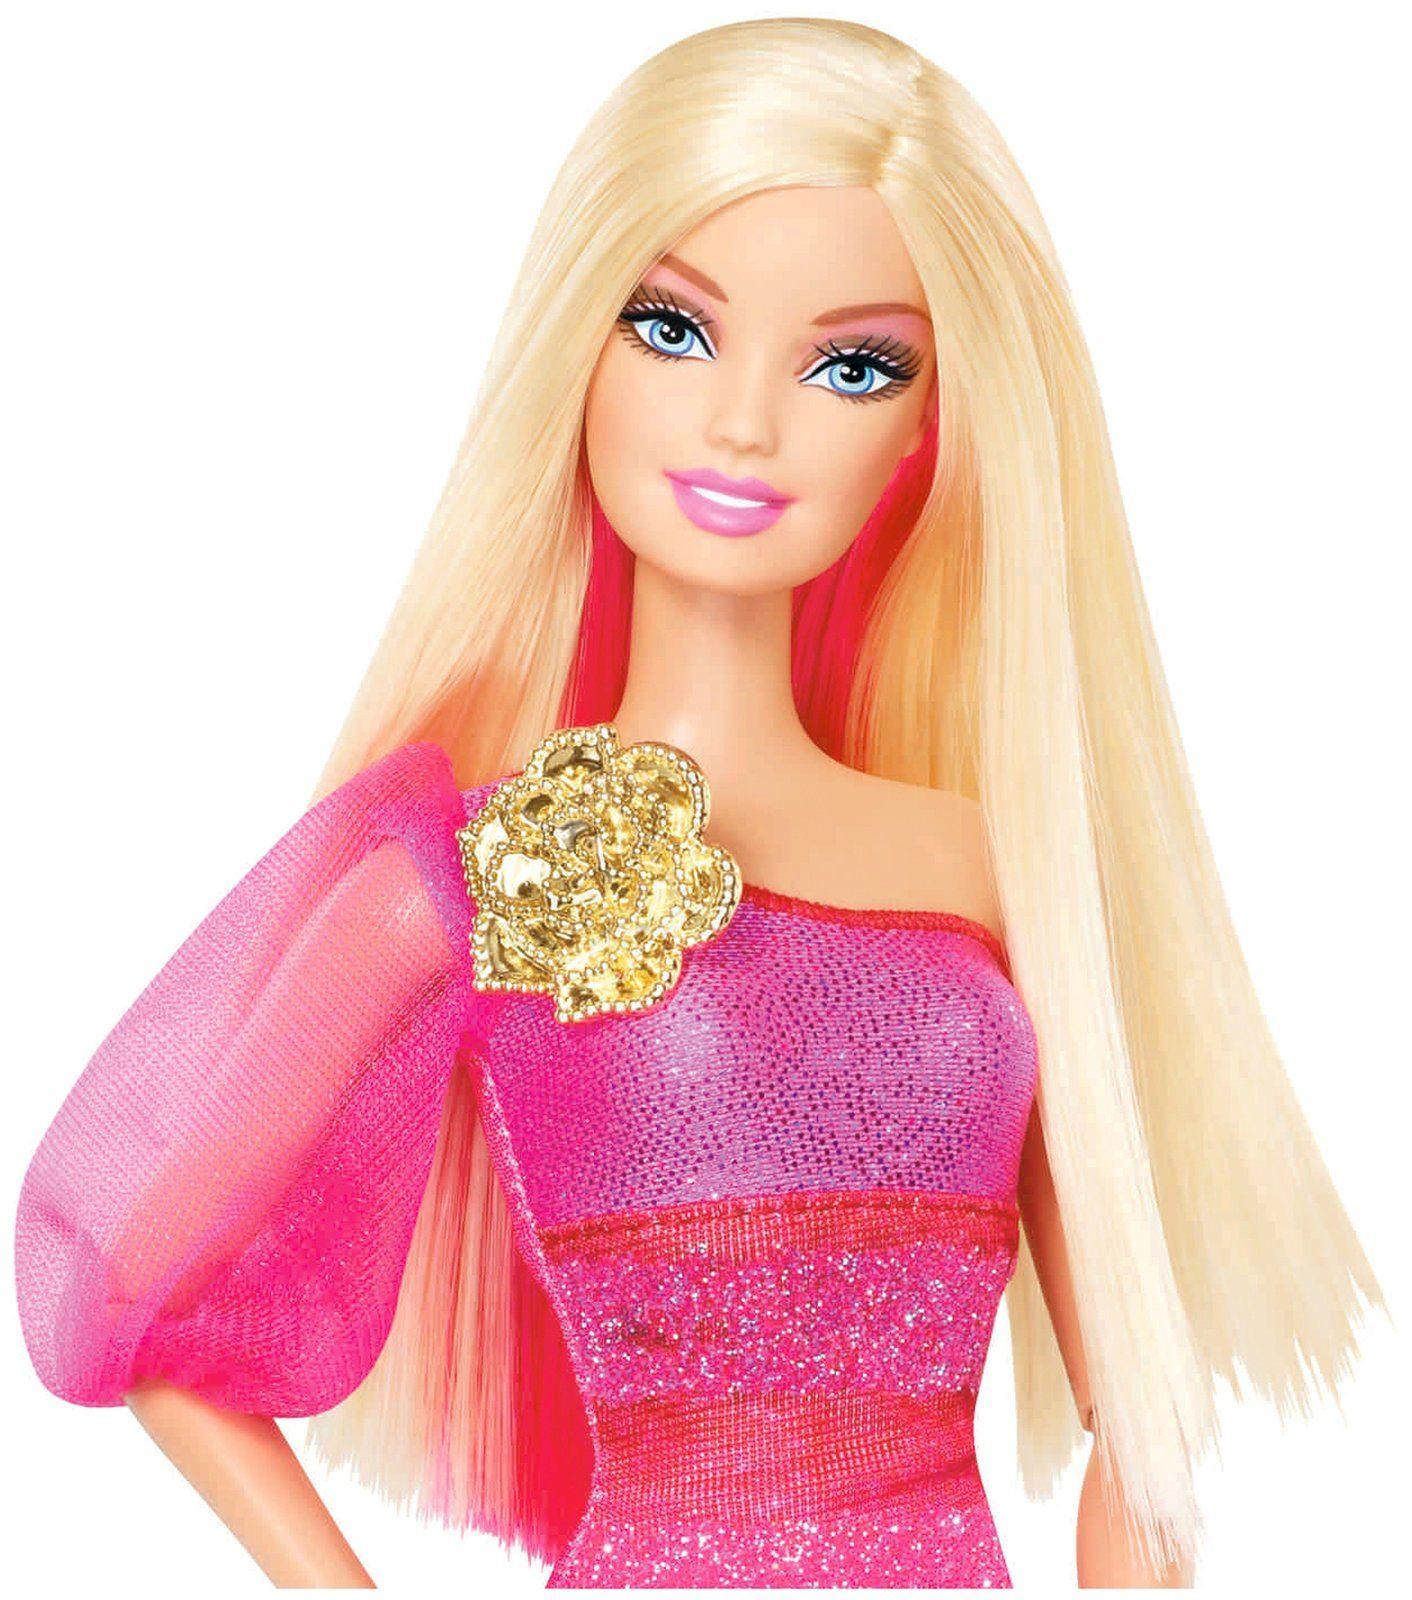 barbie dolls   ... barbie fashionista barbie doll hot pink ...